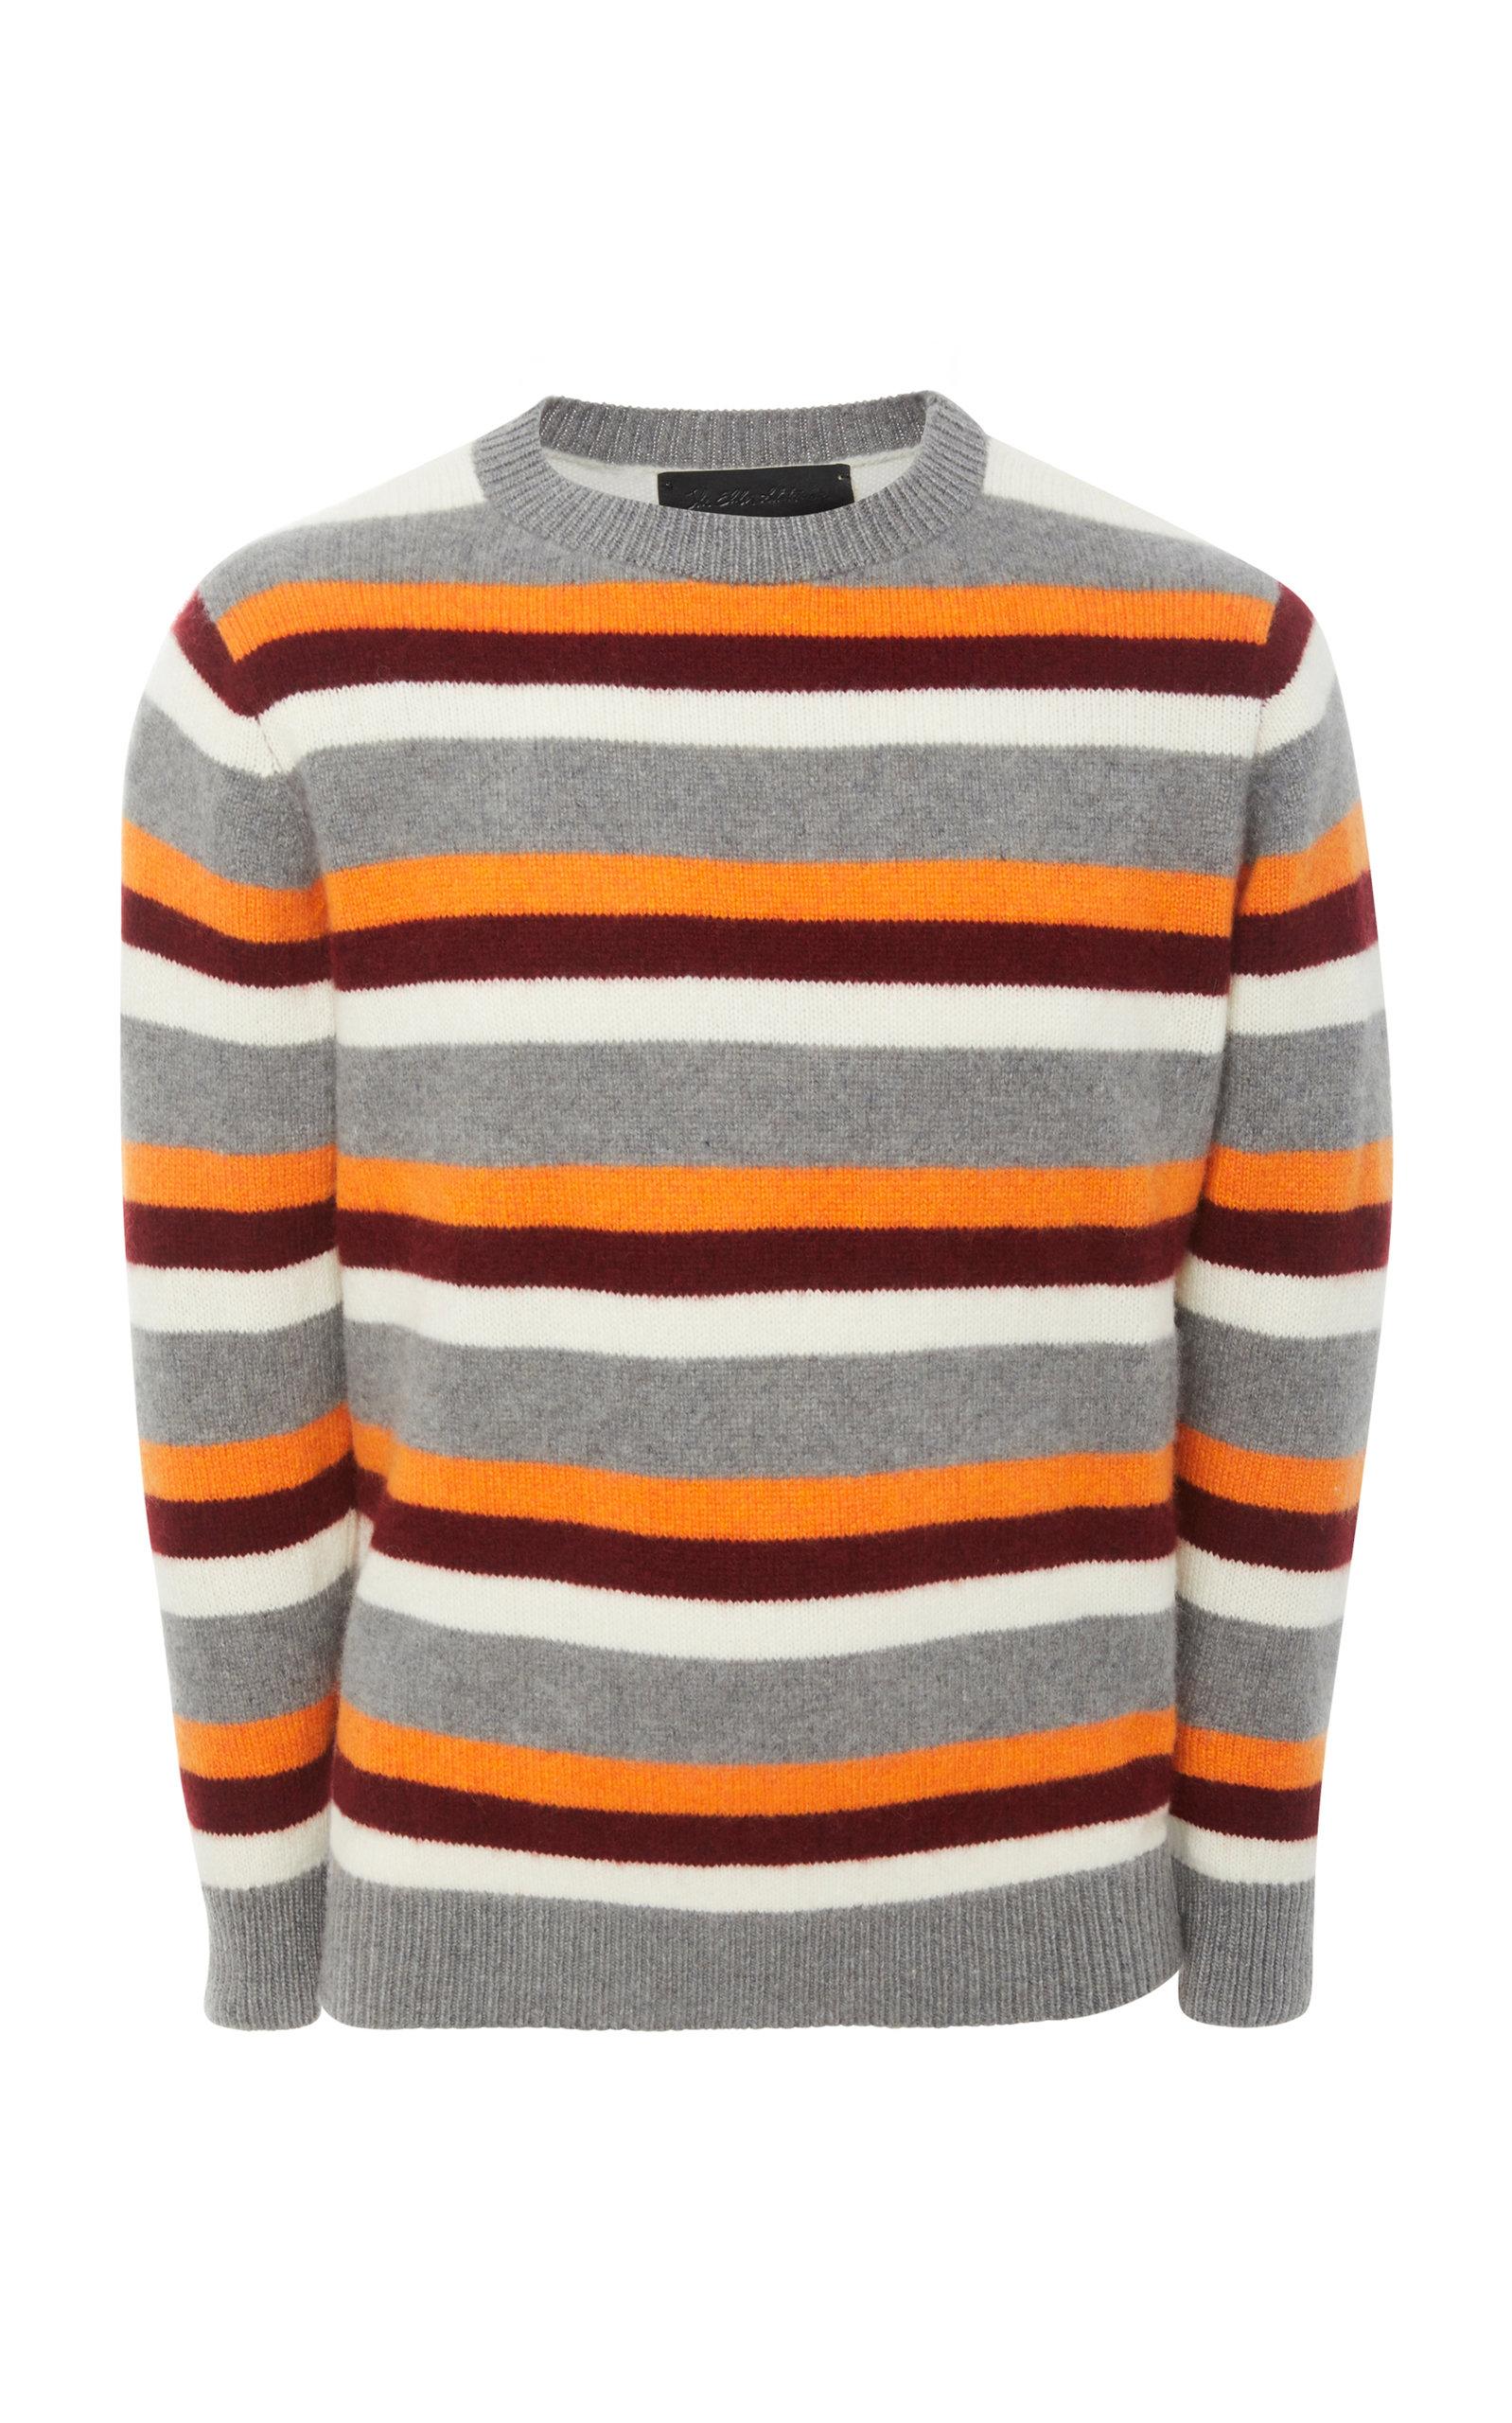 736455864c2 Exclusive Striped Cashmere Sweater